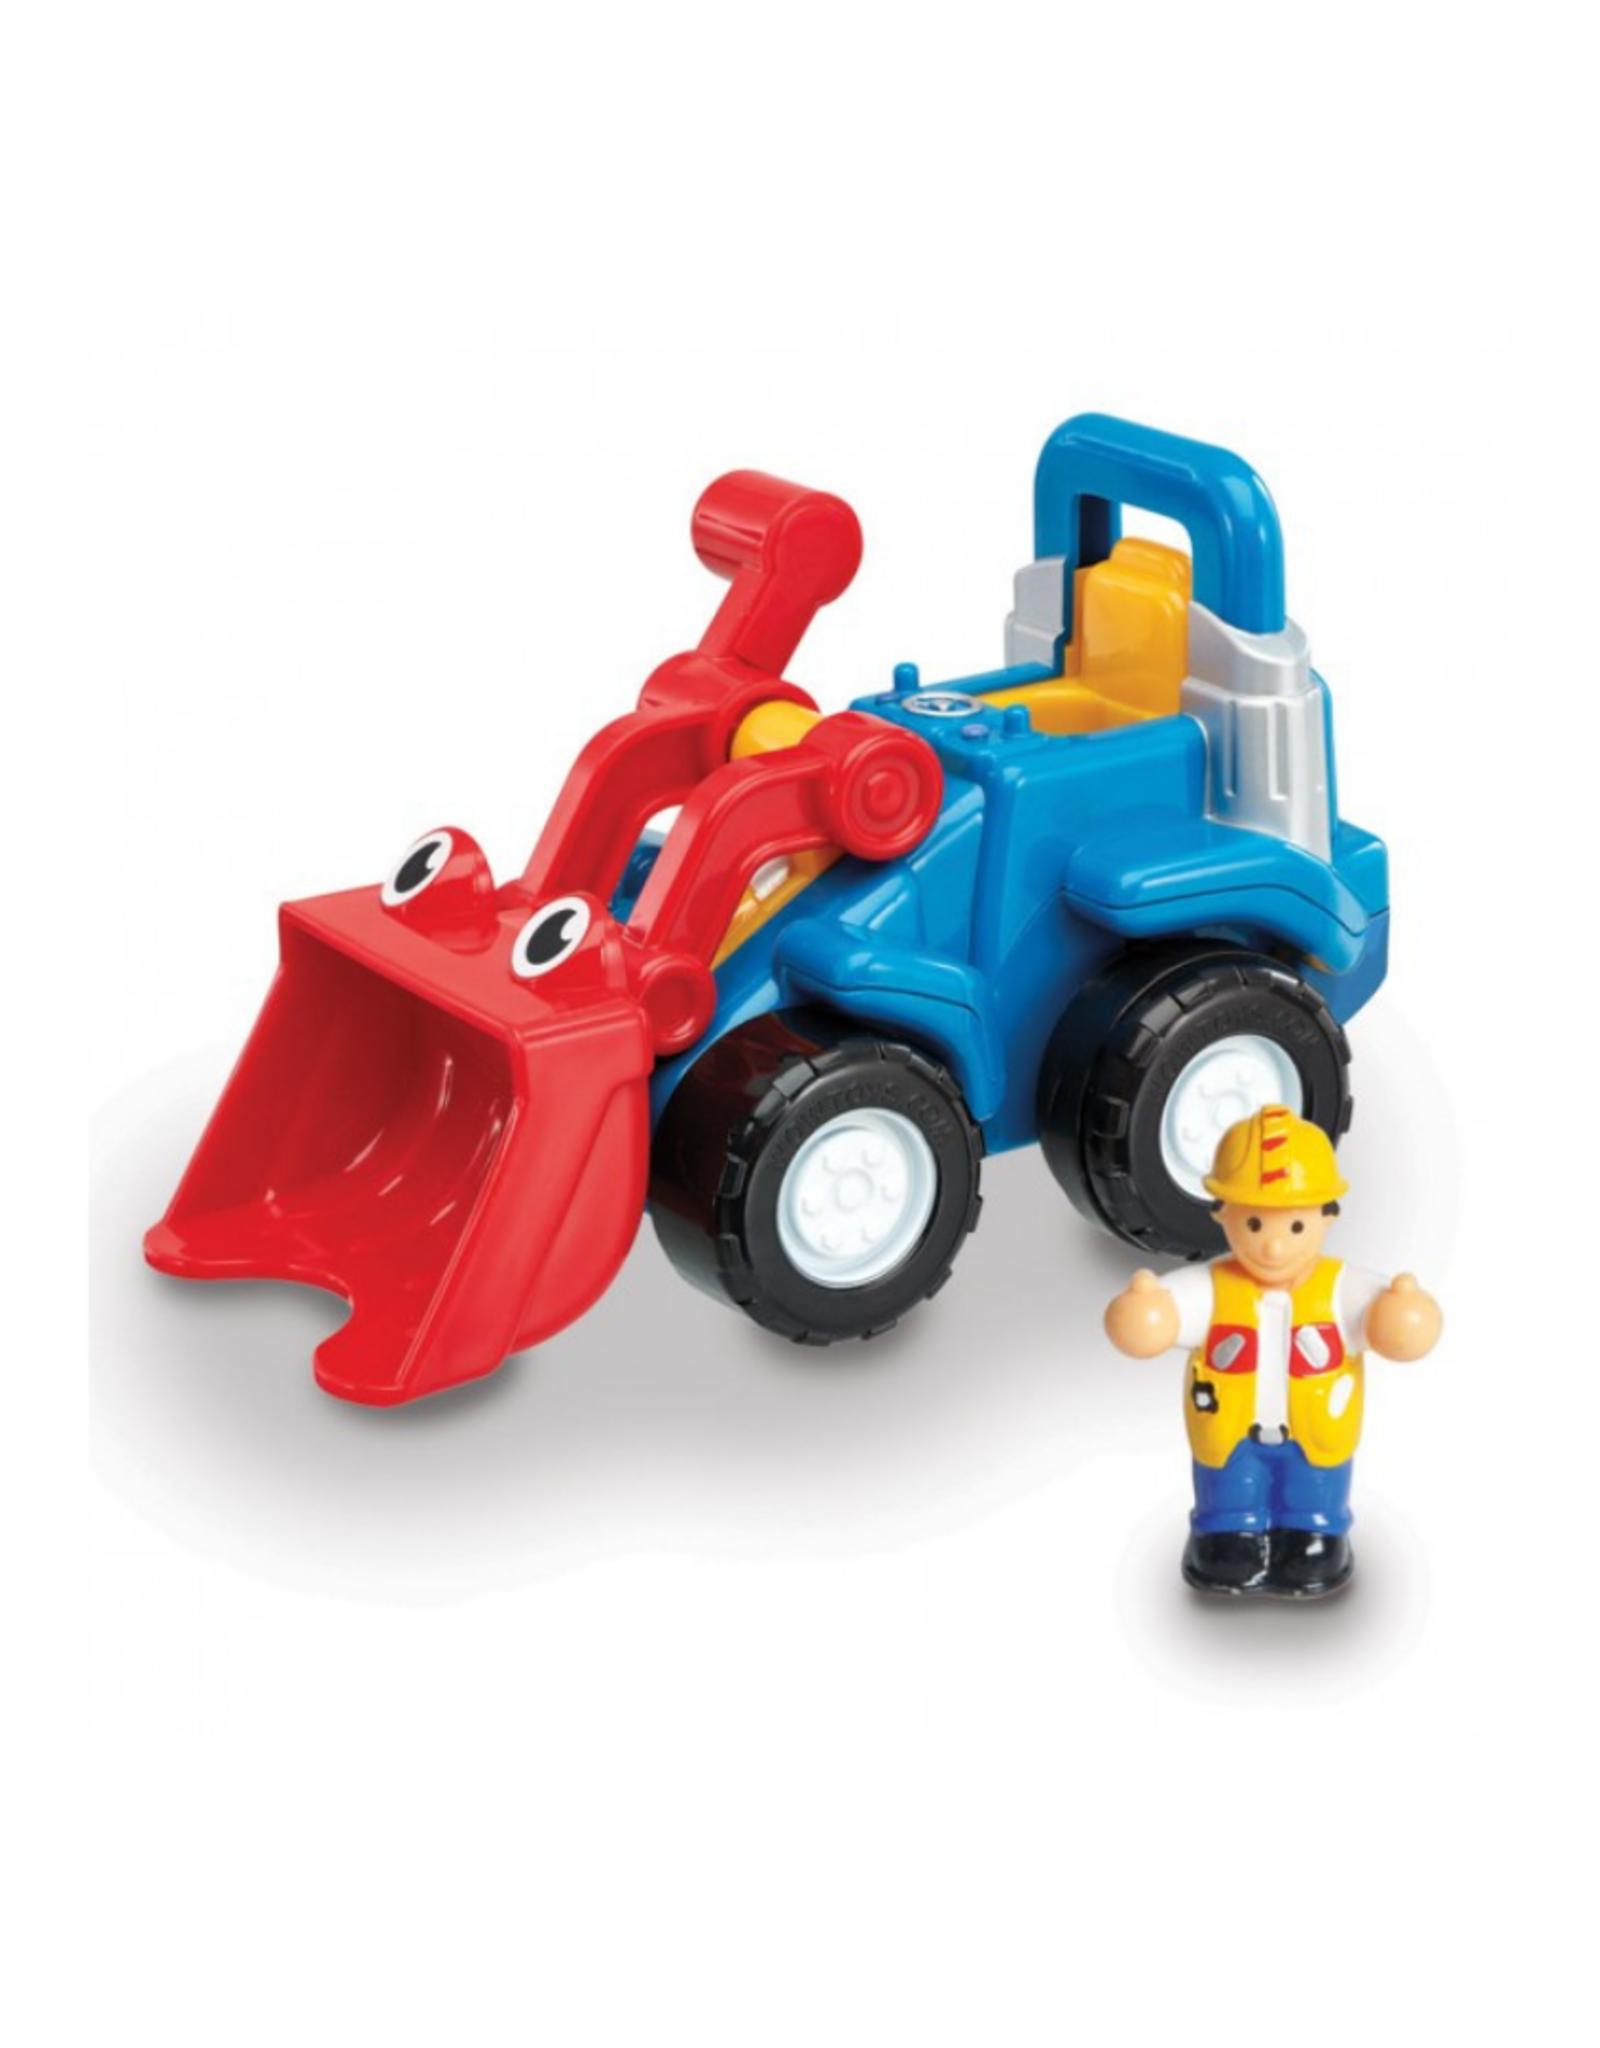 WOW Toys WOW Toys - Lift-it Luke